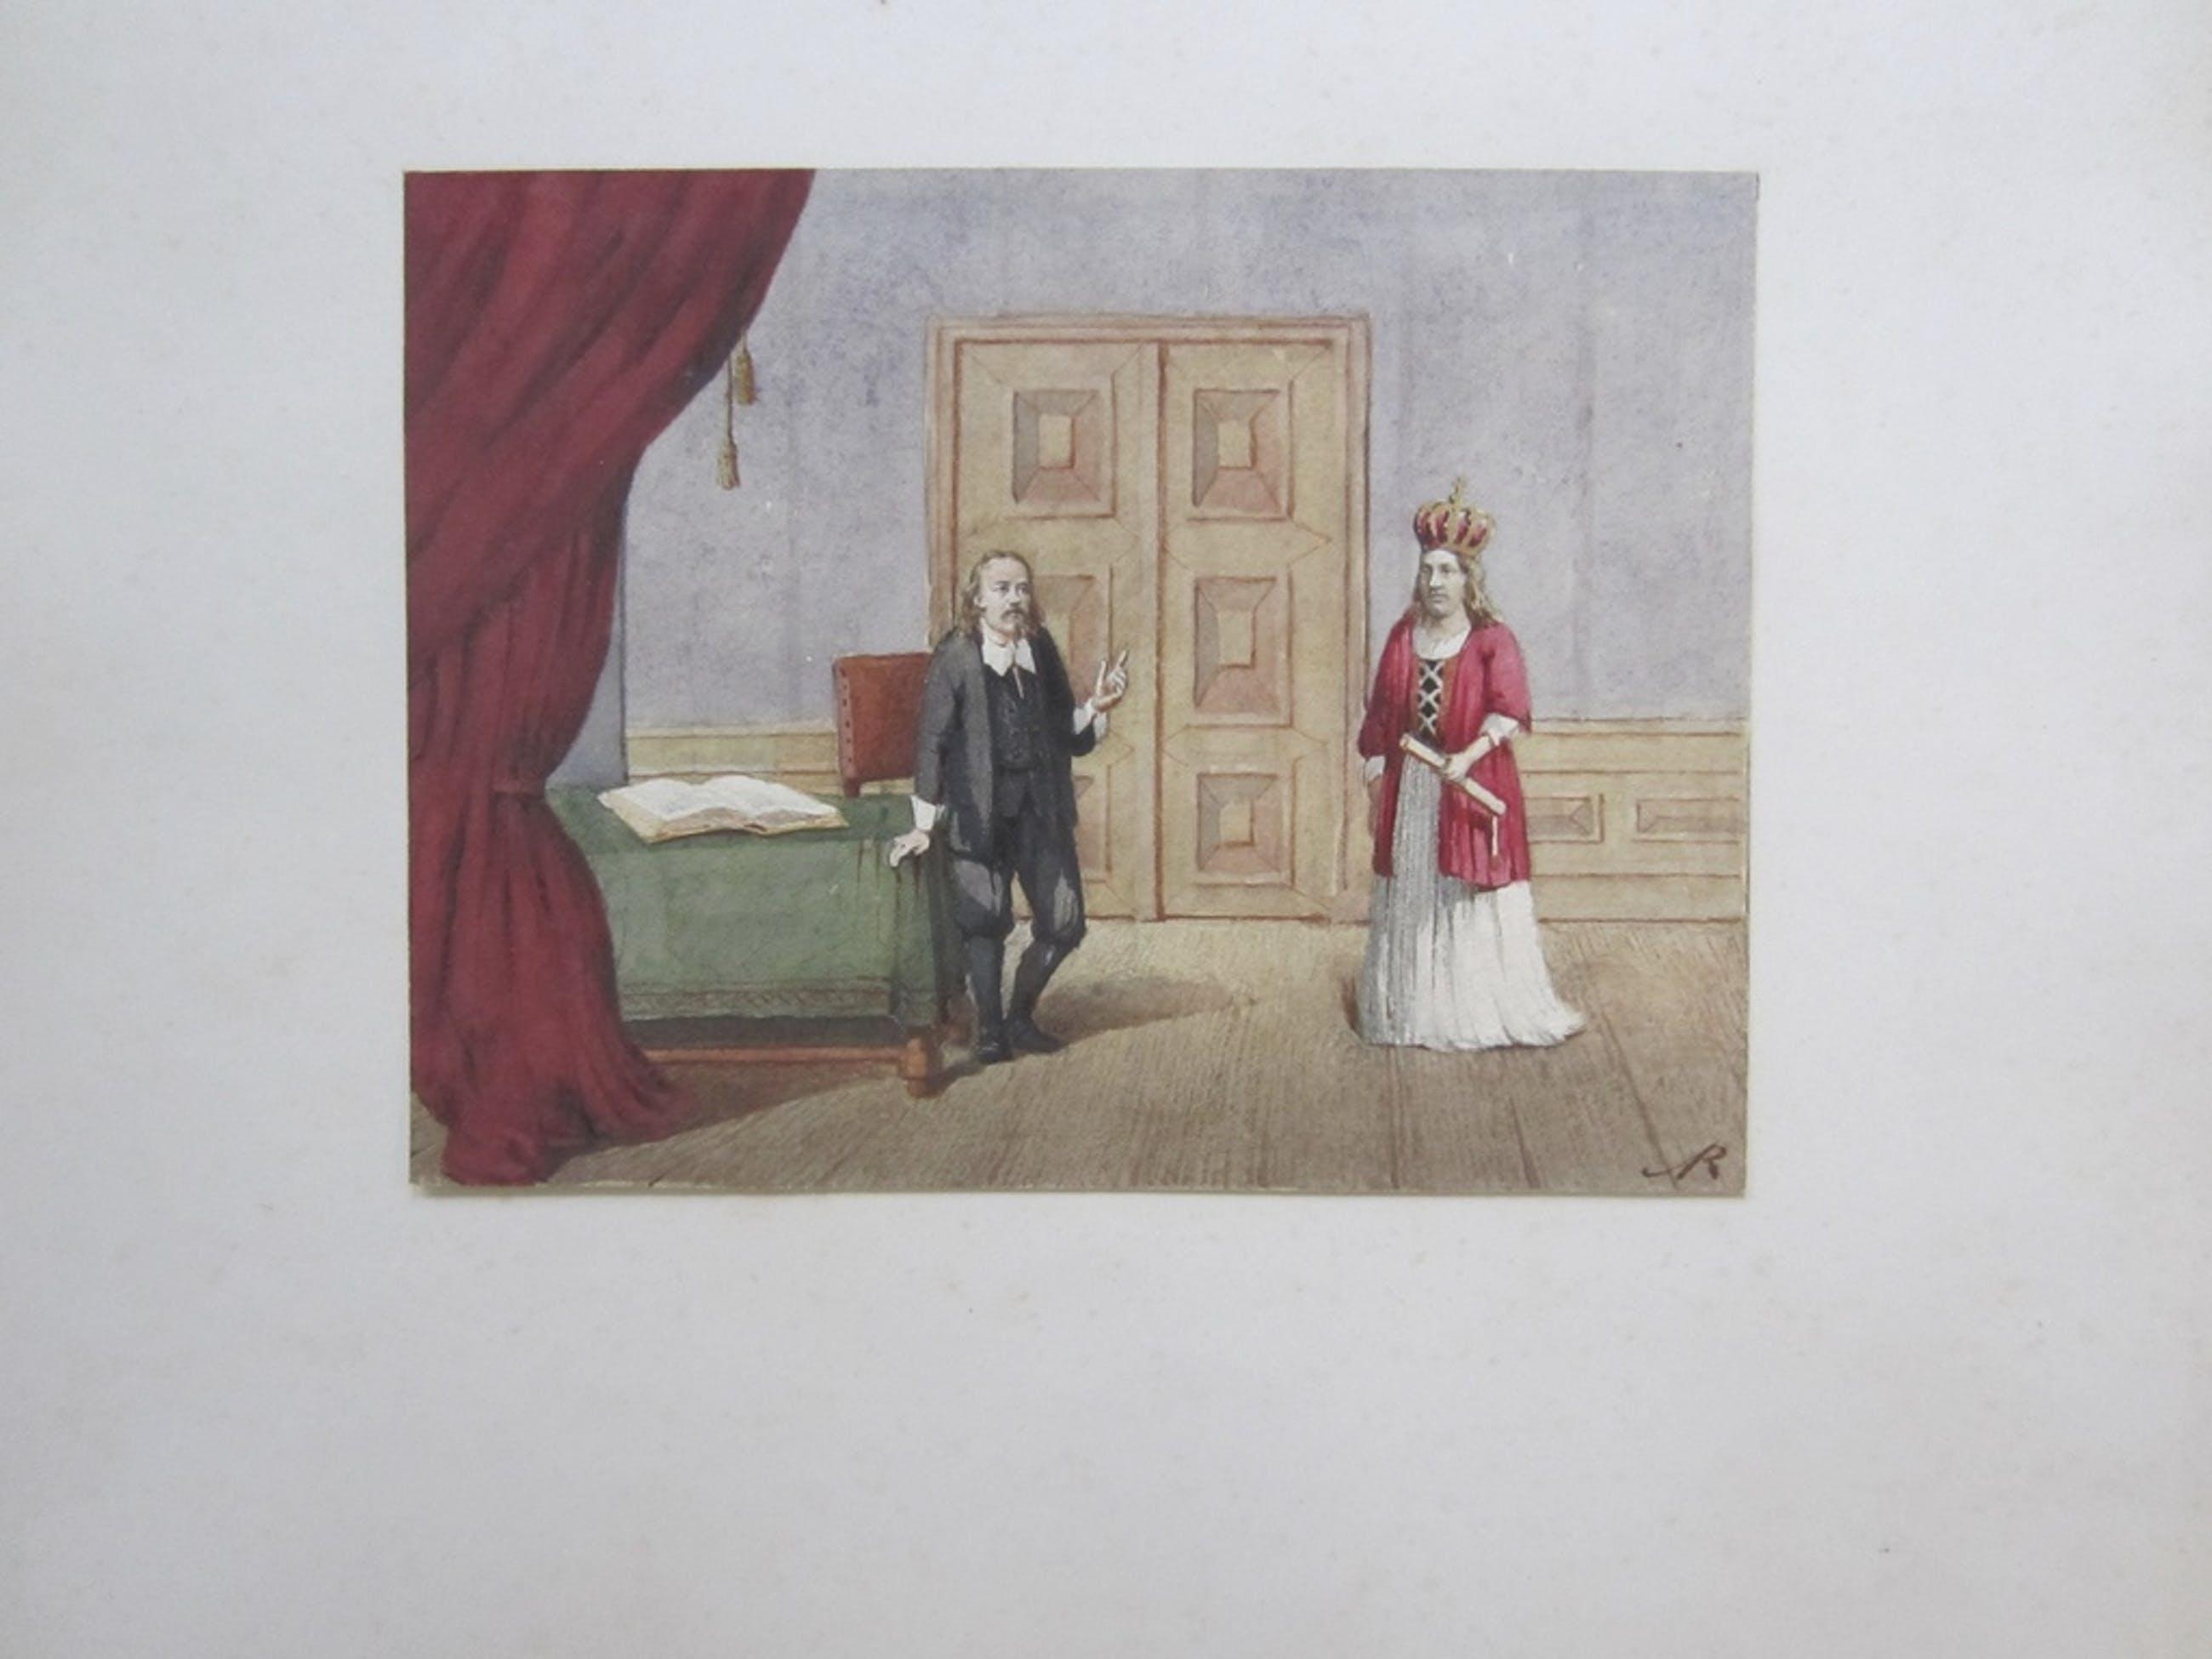 J.M.A. RIEKE 19de EEUWSE AQUAREL TONEELVOORSTELLING AMSTERDAM kopen? Bied vanaf 1!